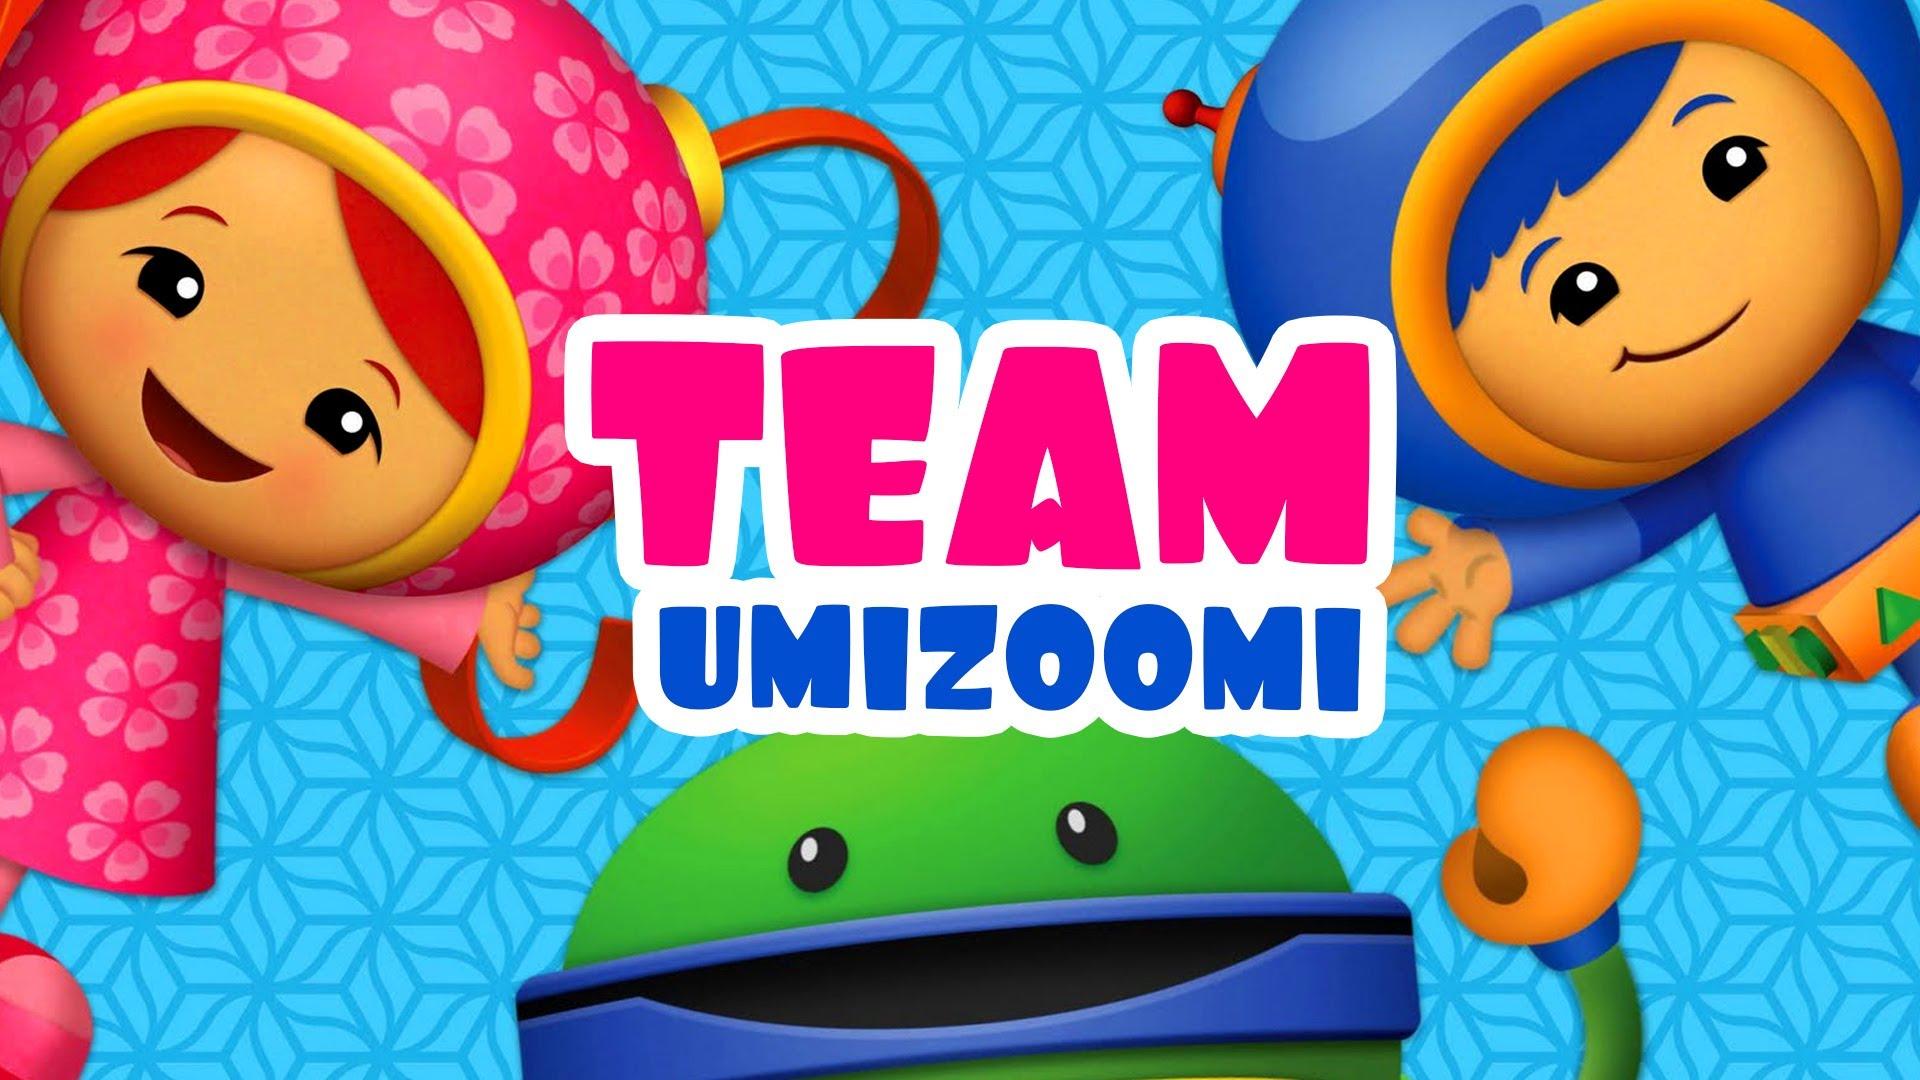 team umizoomi hd wallpaper 52985